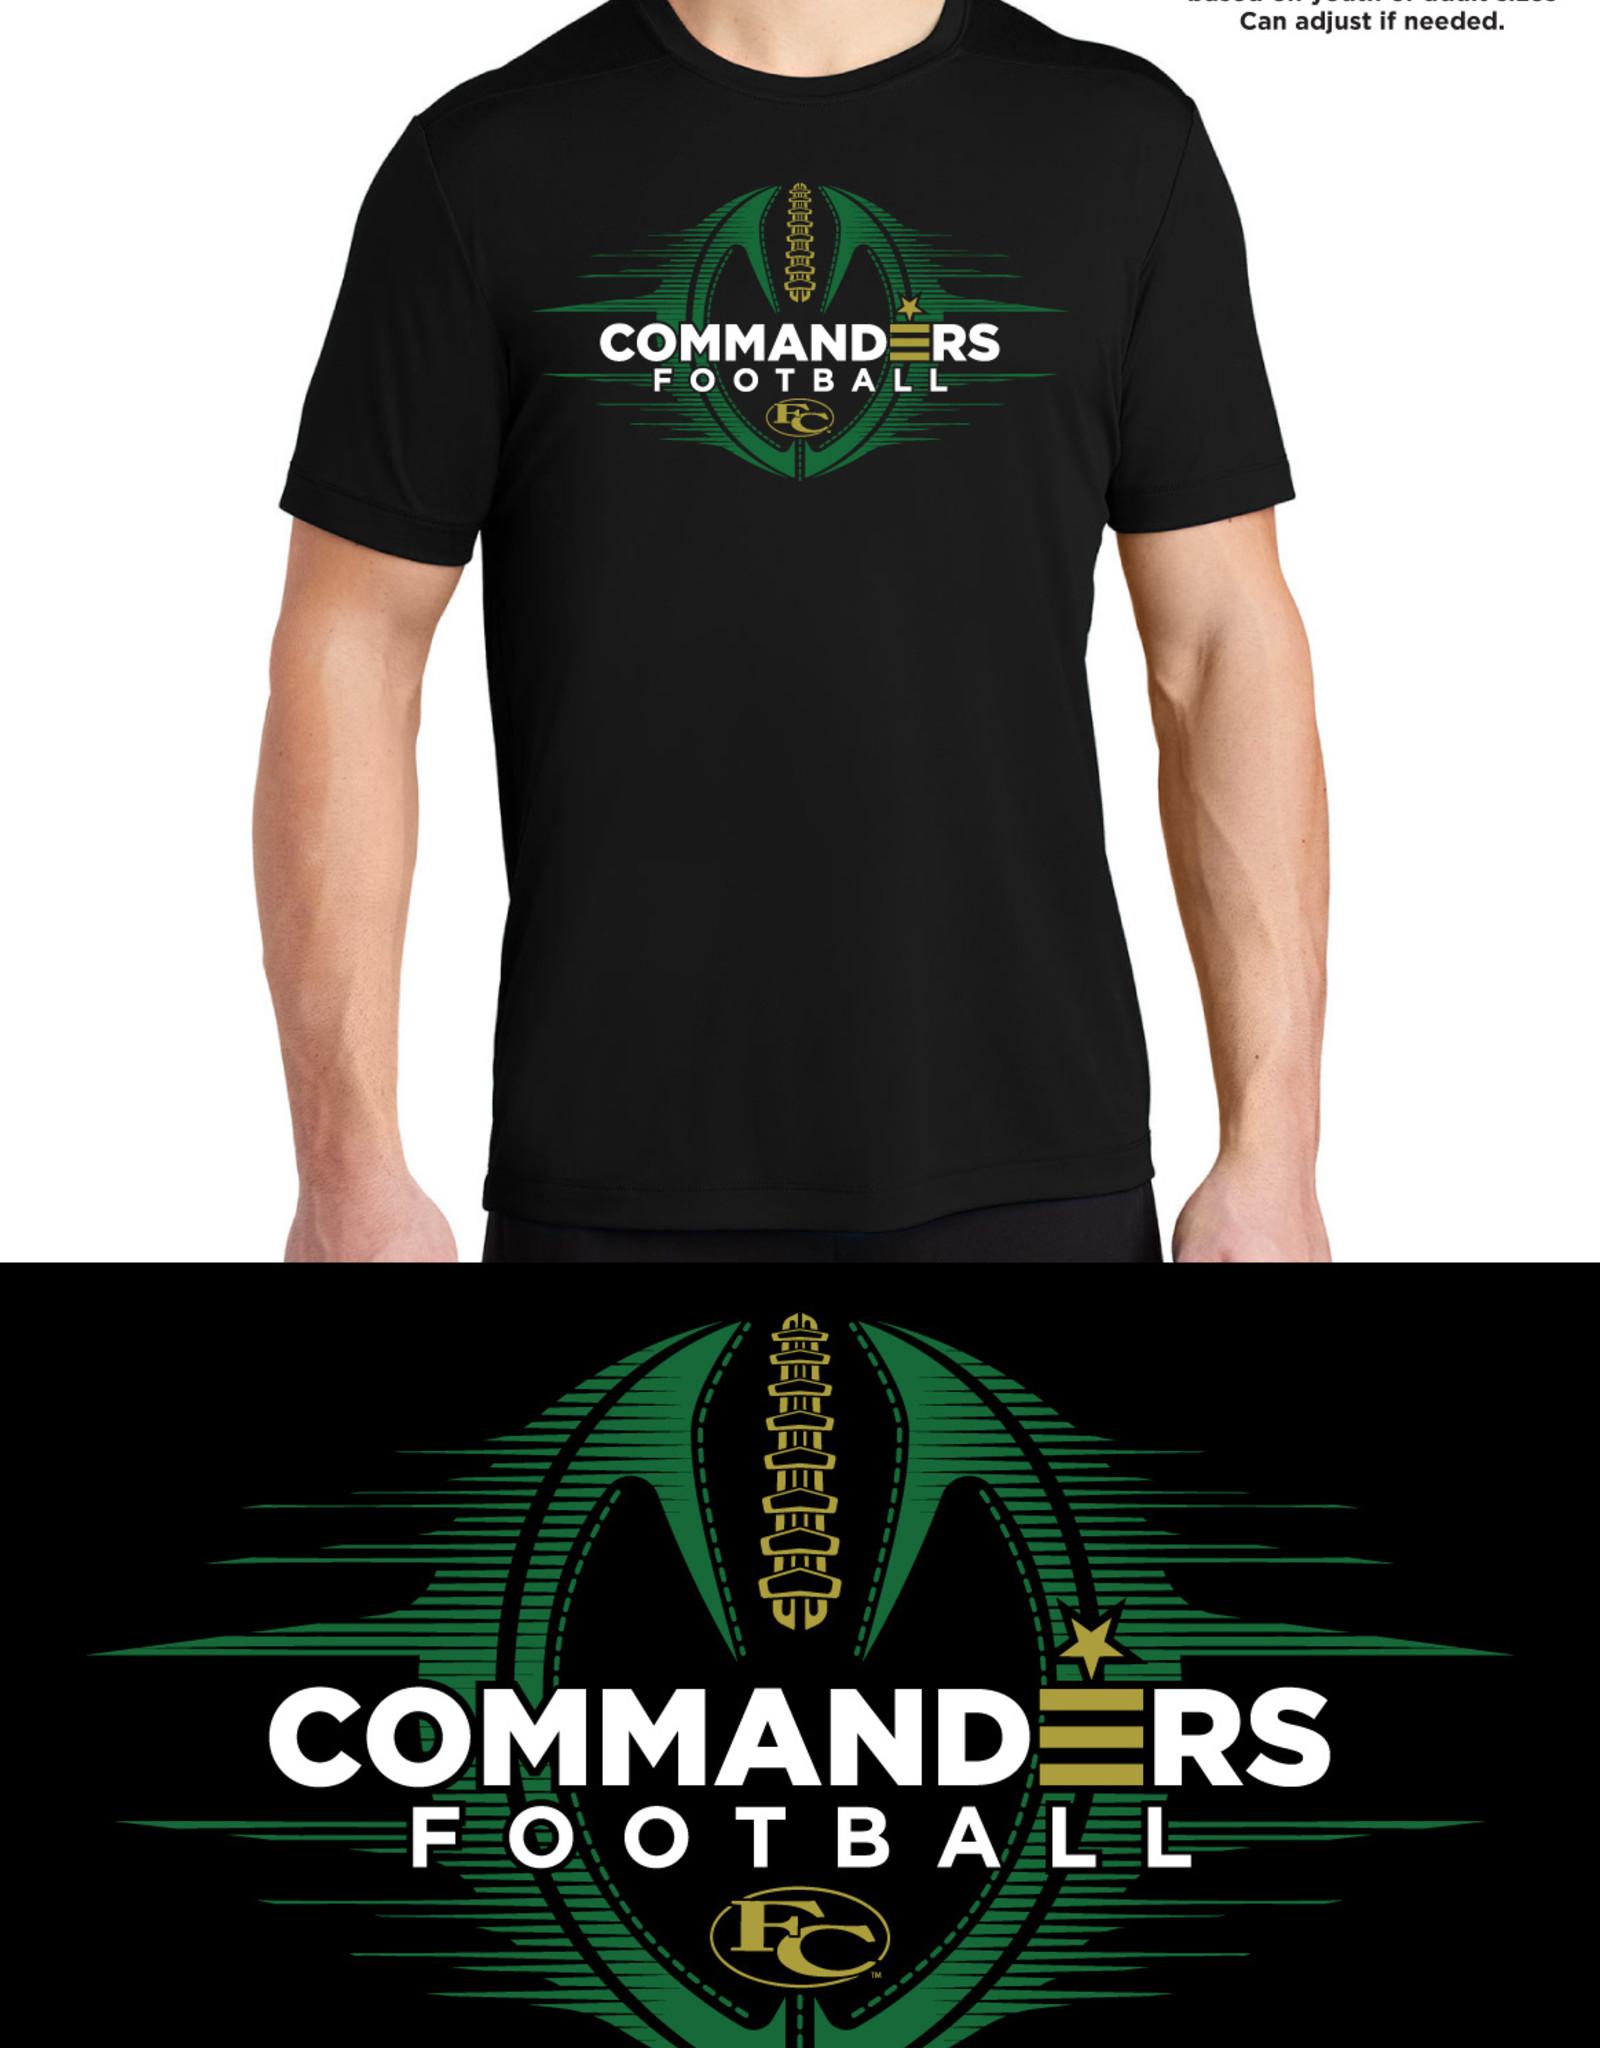 Commanders Football Black